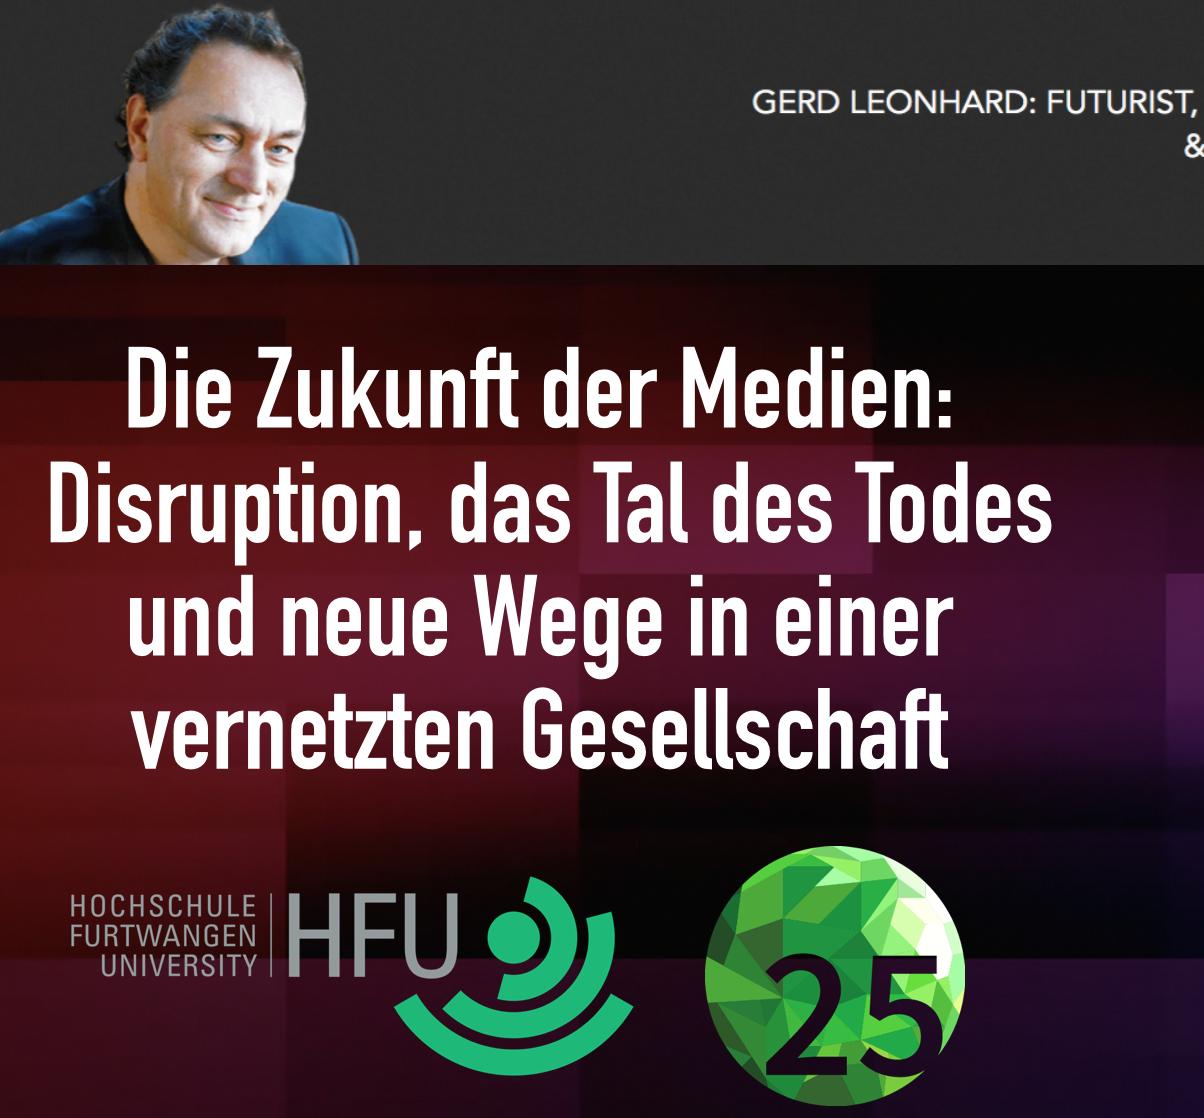 gerd-leonhard-futurist-digitale-Medien